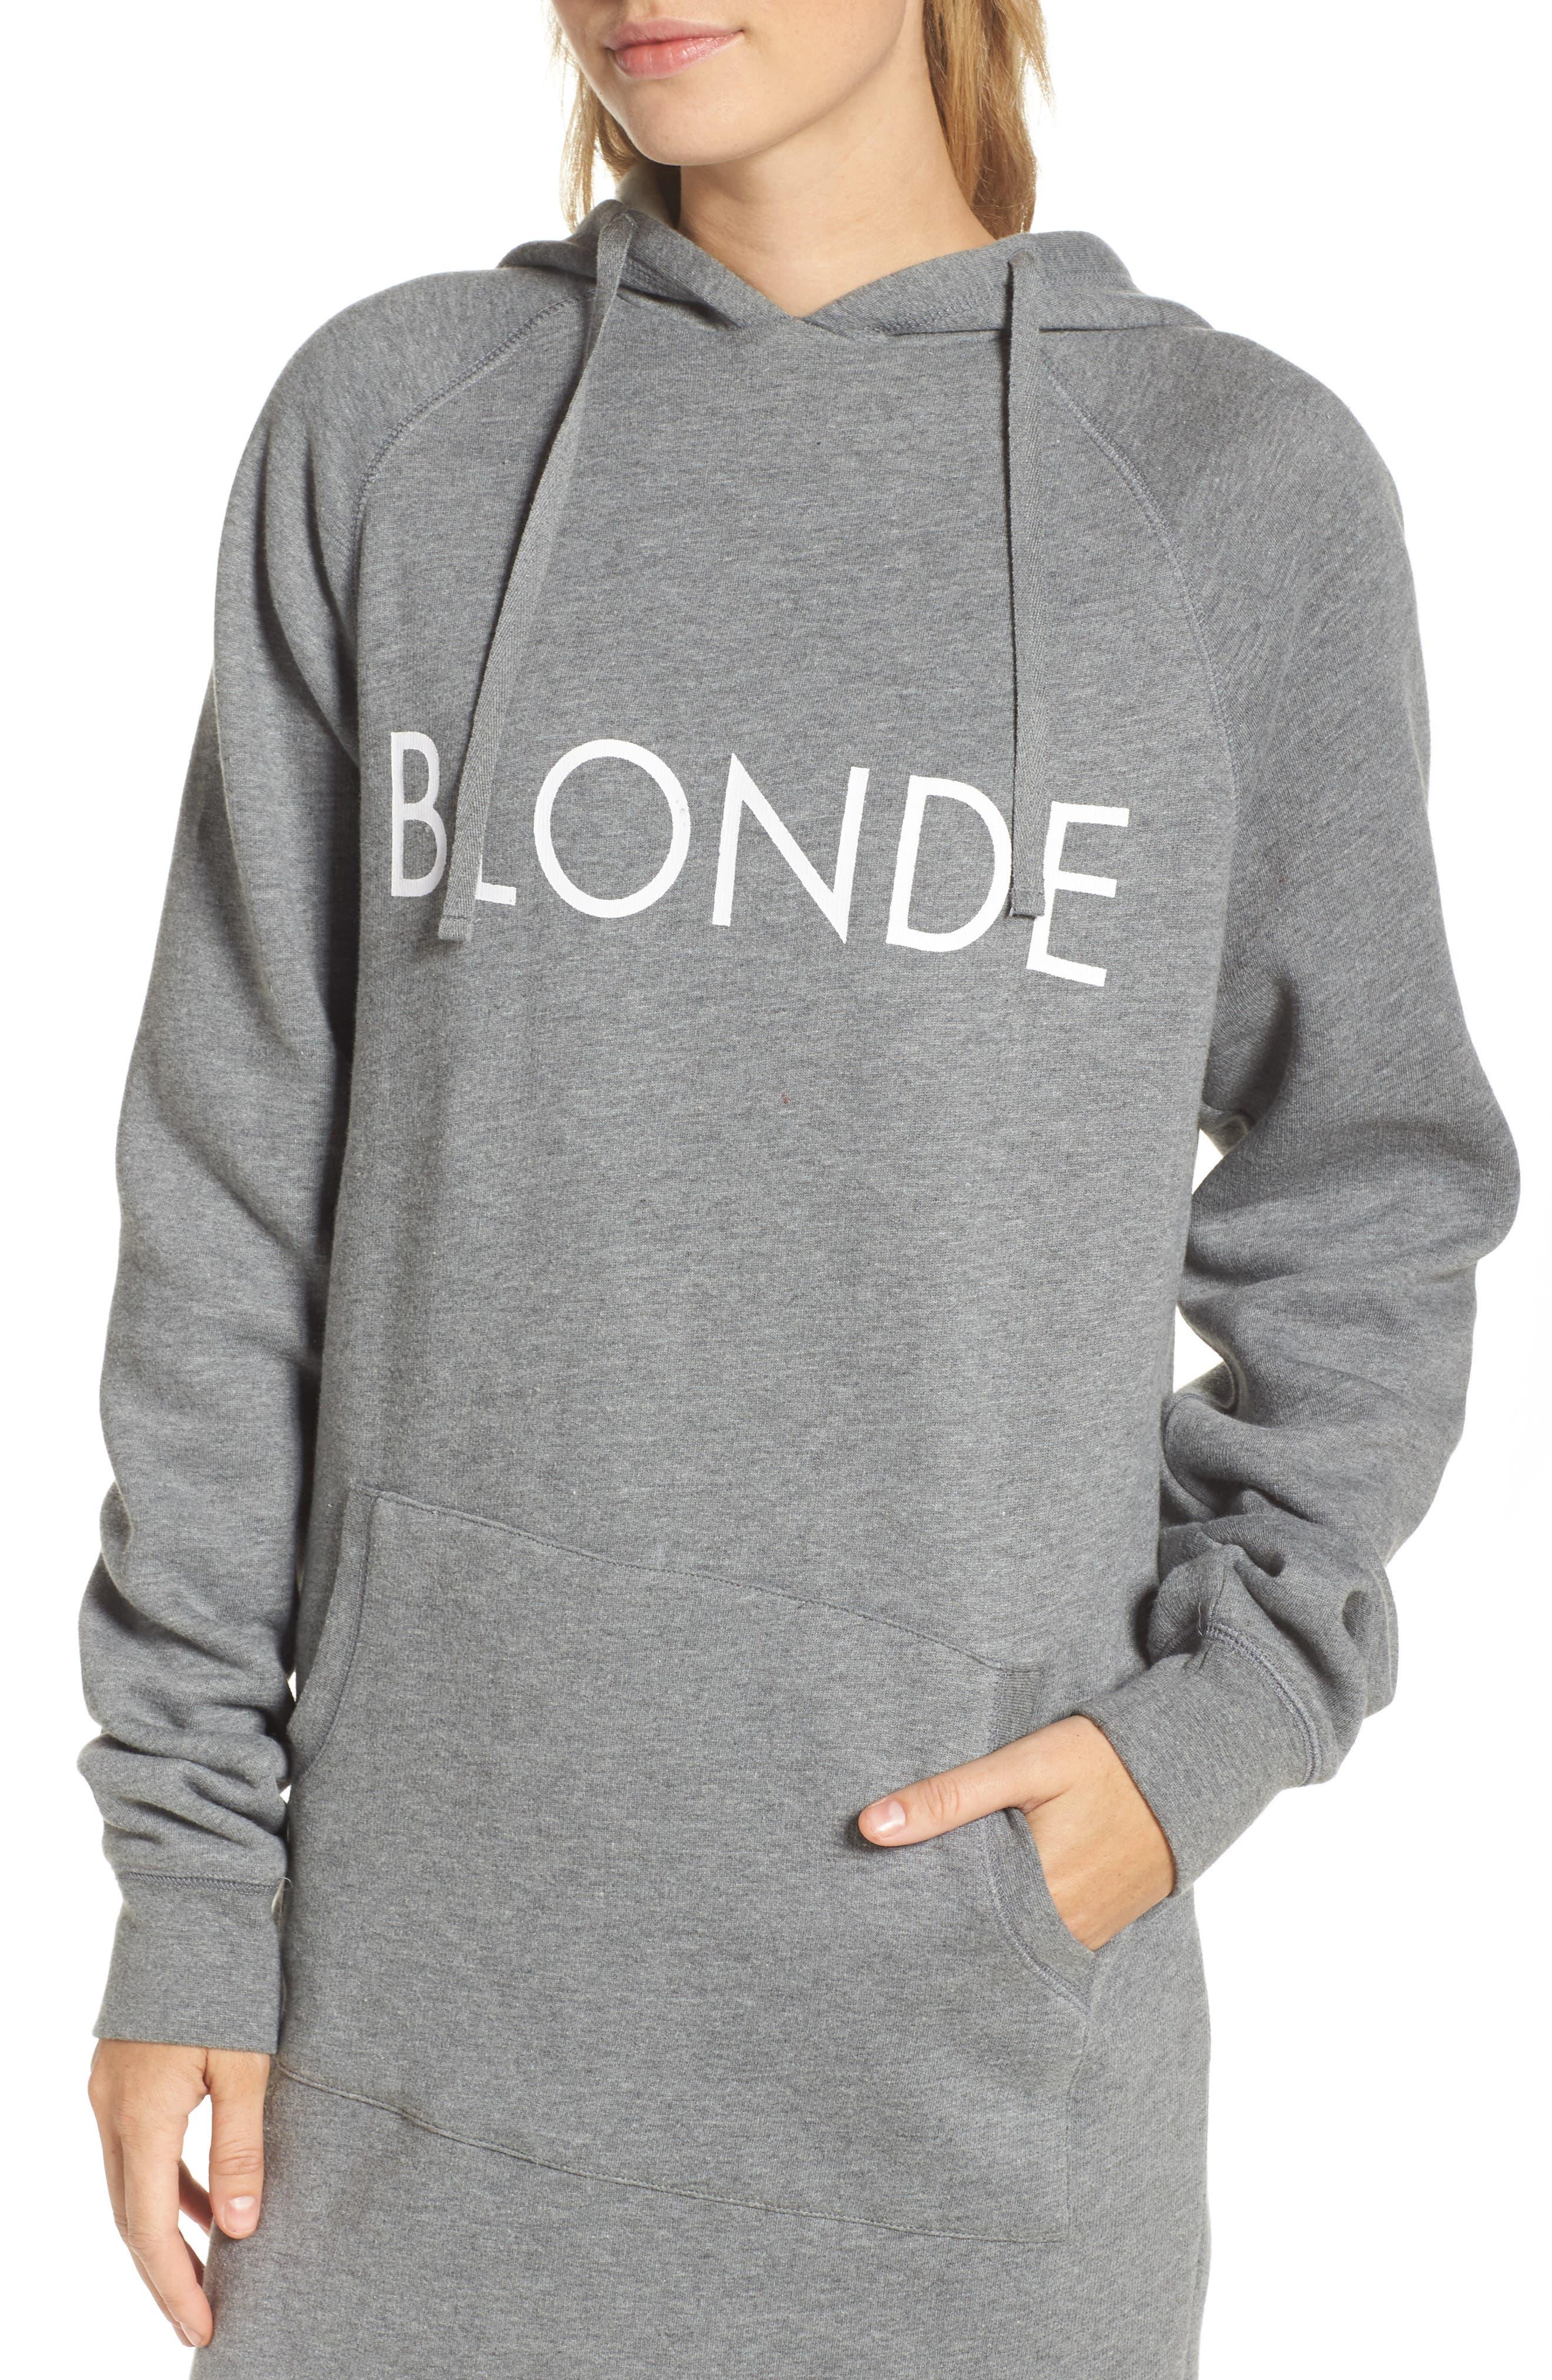 Blonde Sweatshirt Dress,                             Alternate thumbnail 4, color,                             Heather Grey White